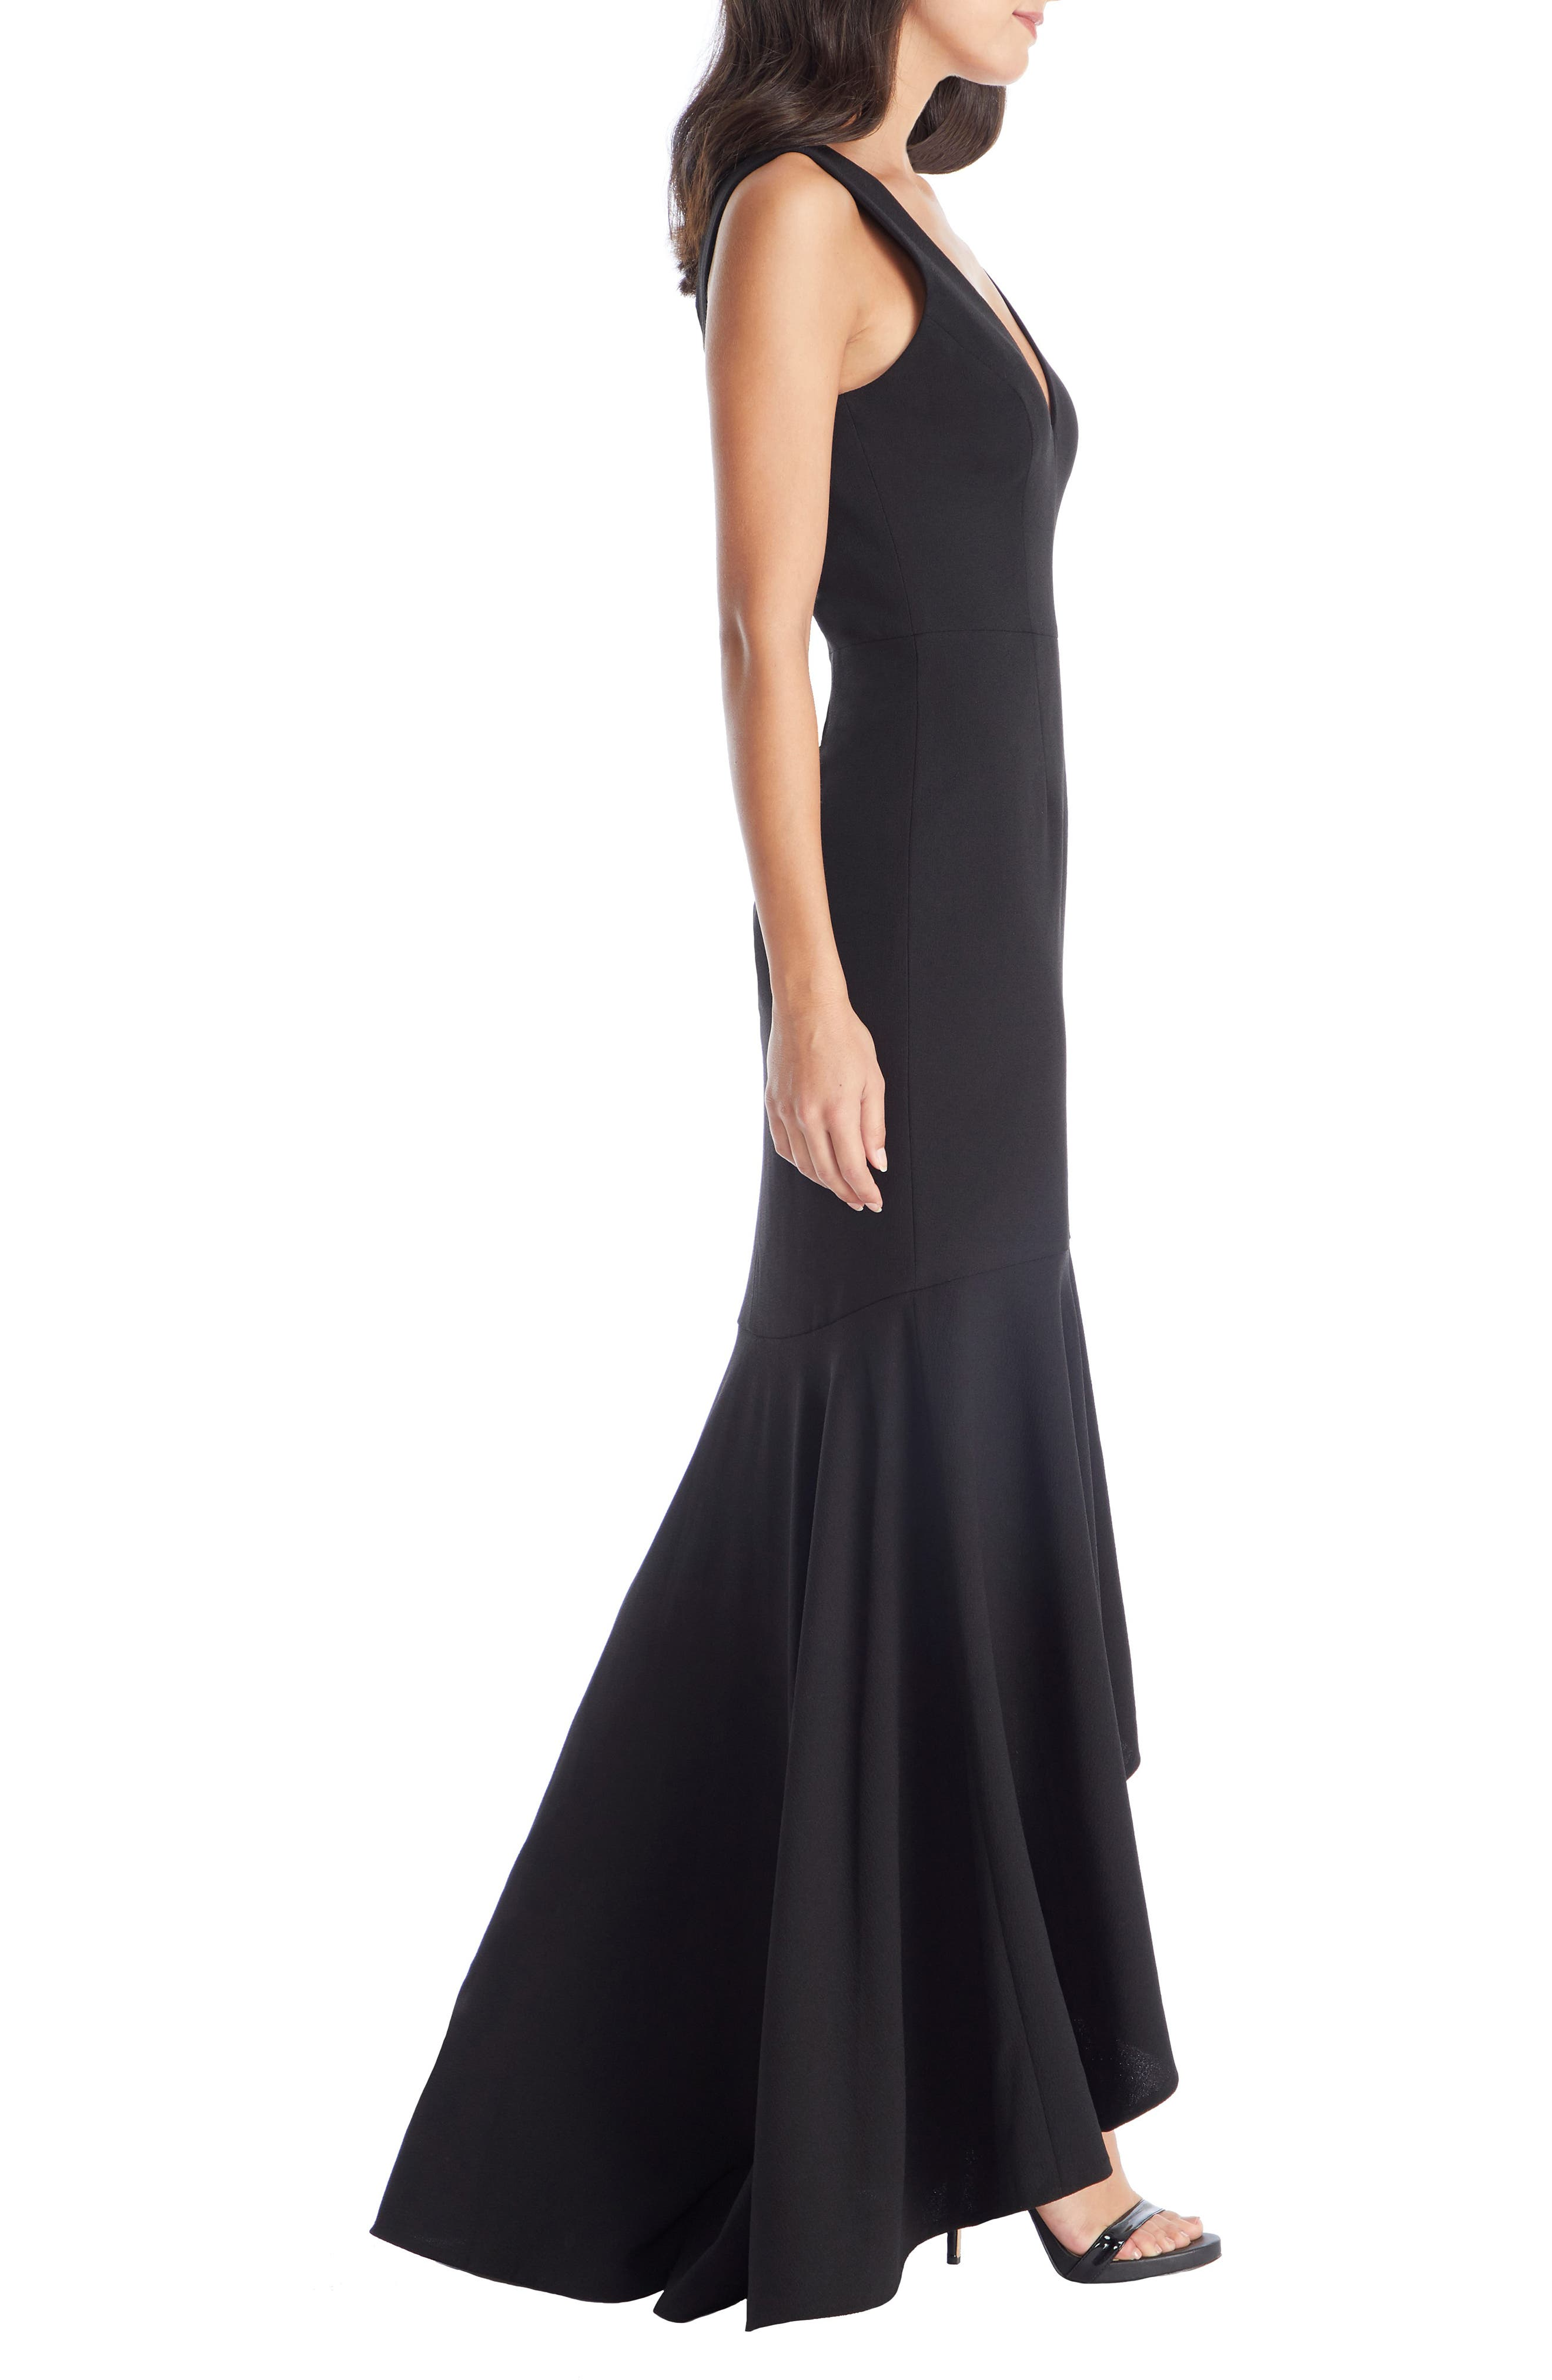 DRESS THE POPULATION, Demi High/Low Mermaid Hem Evening Dress, Alternate thumbnail 3, color, BLACK